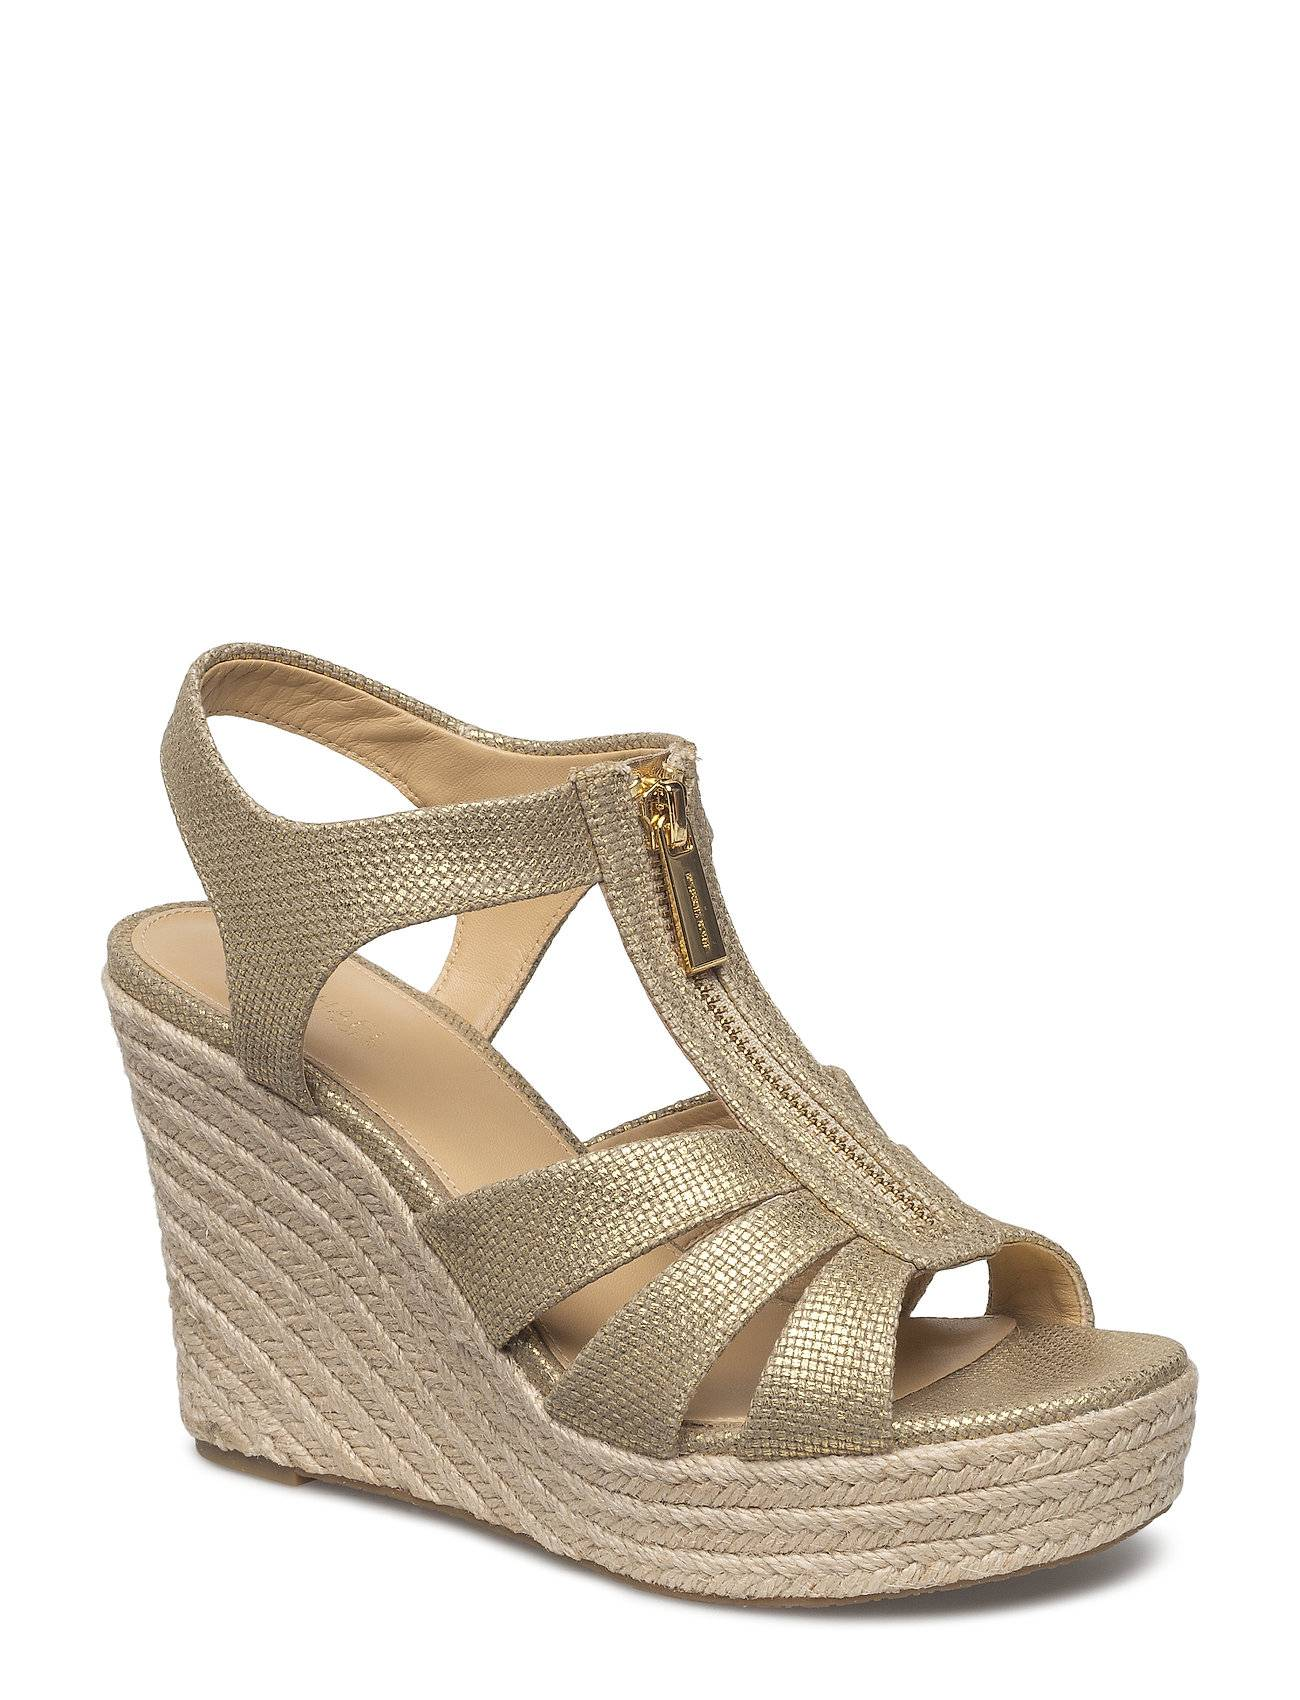 Michael Kors Shoes Berkley Wedge Korolliset Sandaalit Espadrillot Kulta Michael Kors Shoes